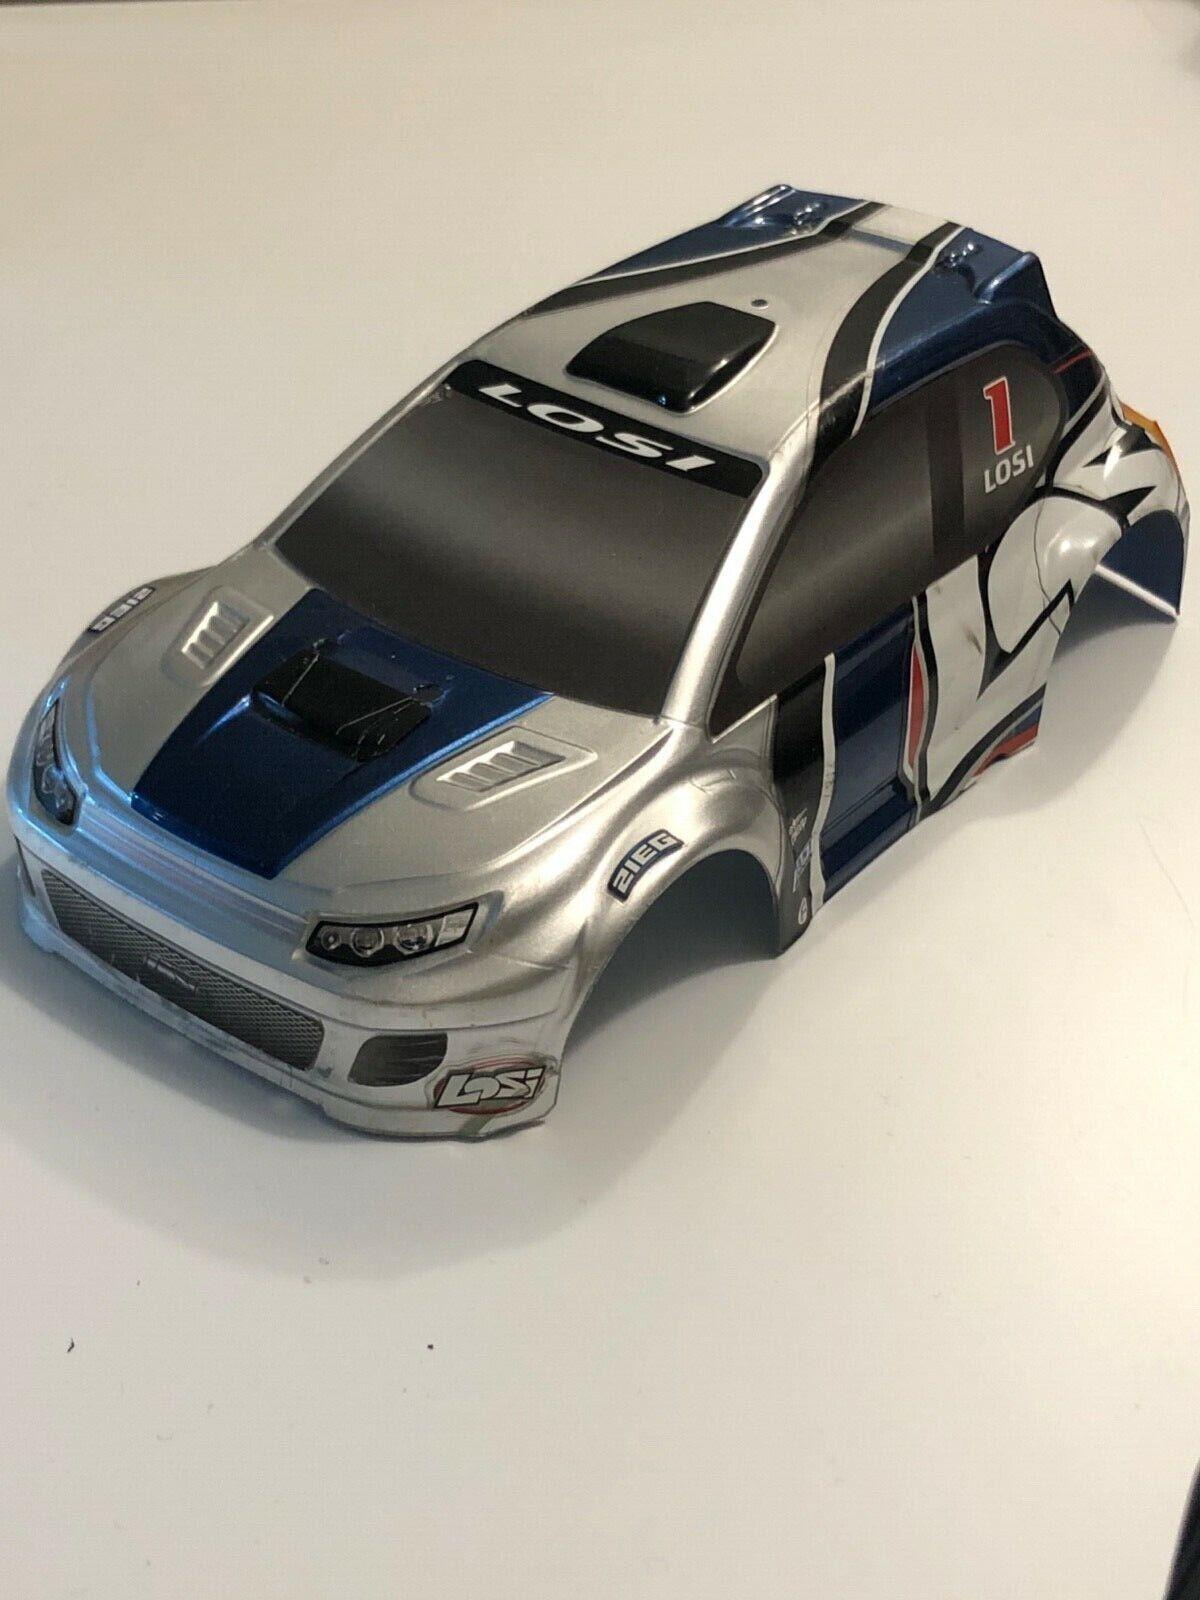 Team Losi 1/24 Micro Rally Car Body Race Drift  - $41.00